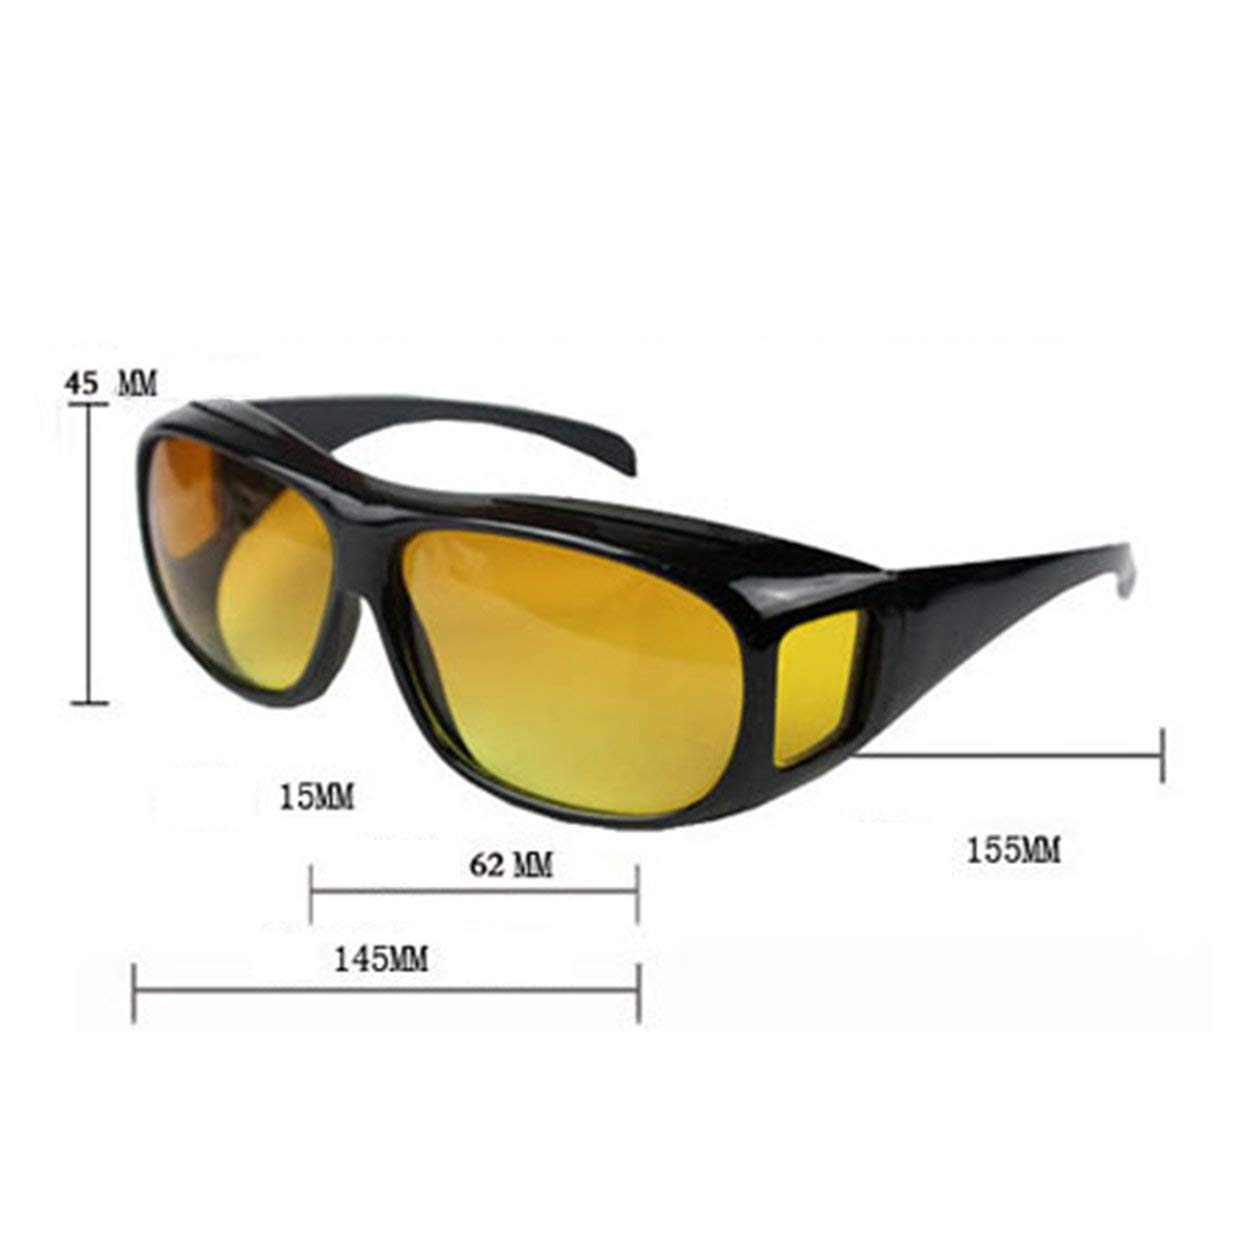 anyilon Night Vision Sunglasses Night Sight HD Driving Glasses Anti-Glare UV400 Protection Night Eyewear for Driver